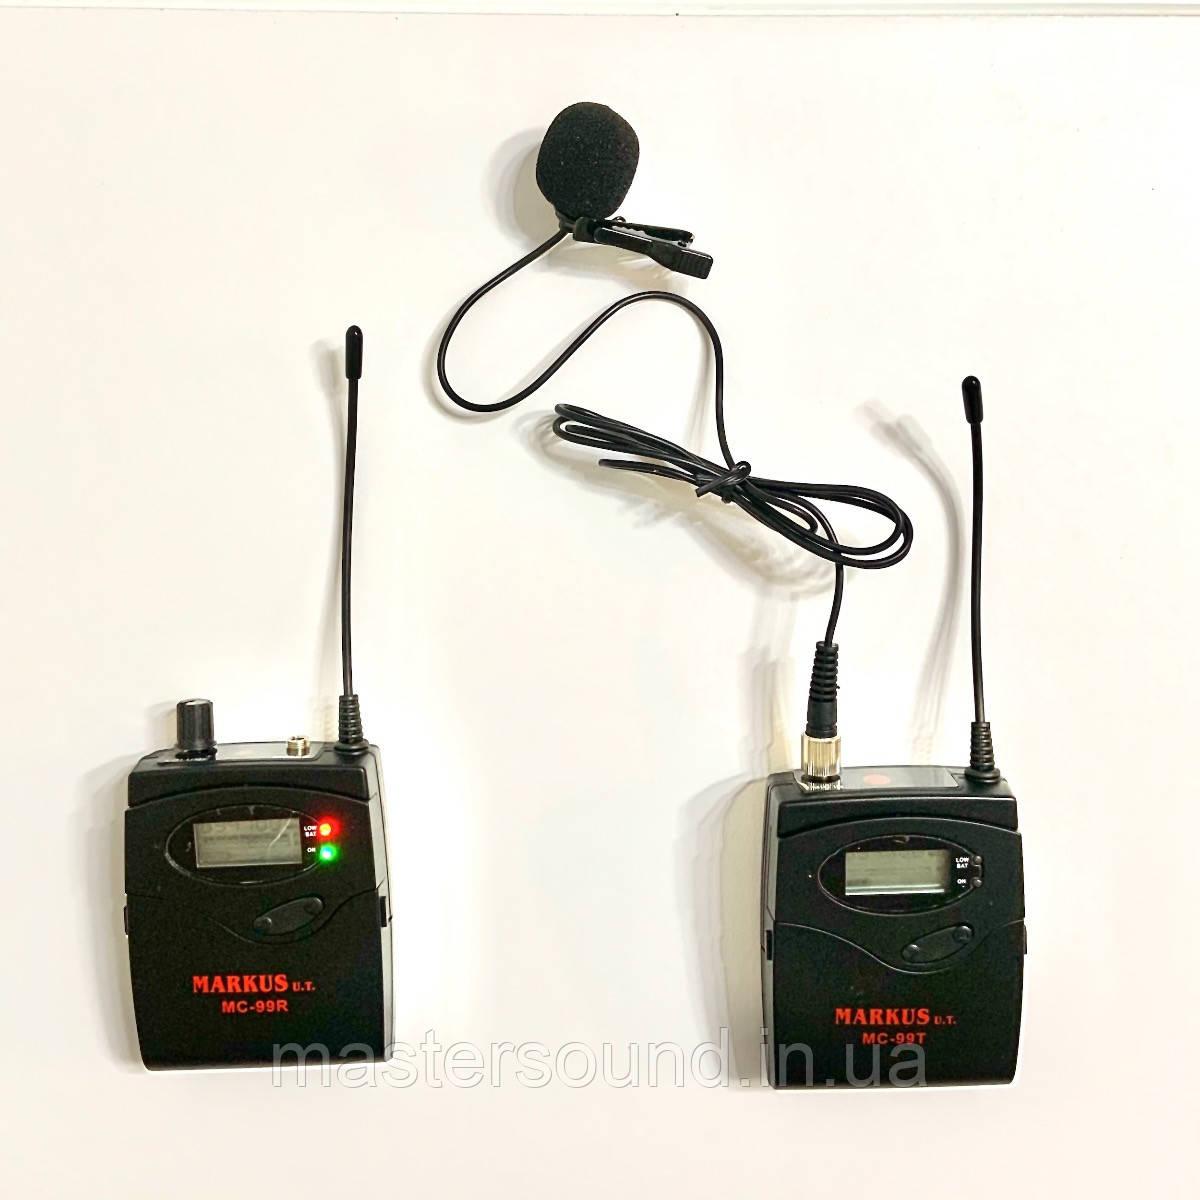 Накамерная радиосистема Markus MC-99